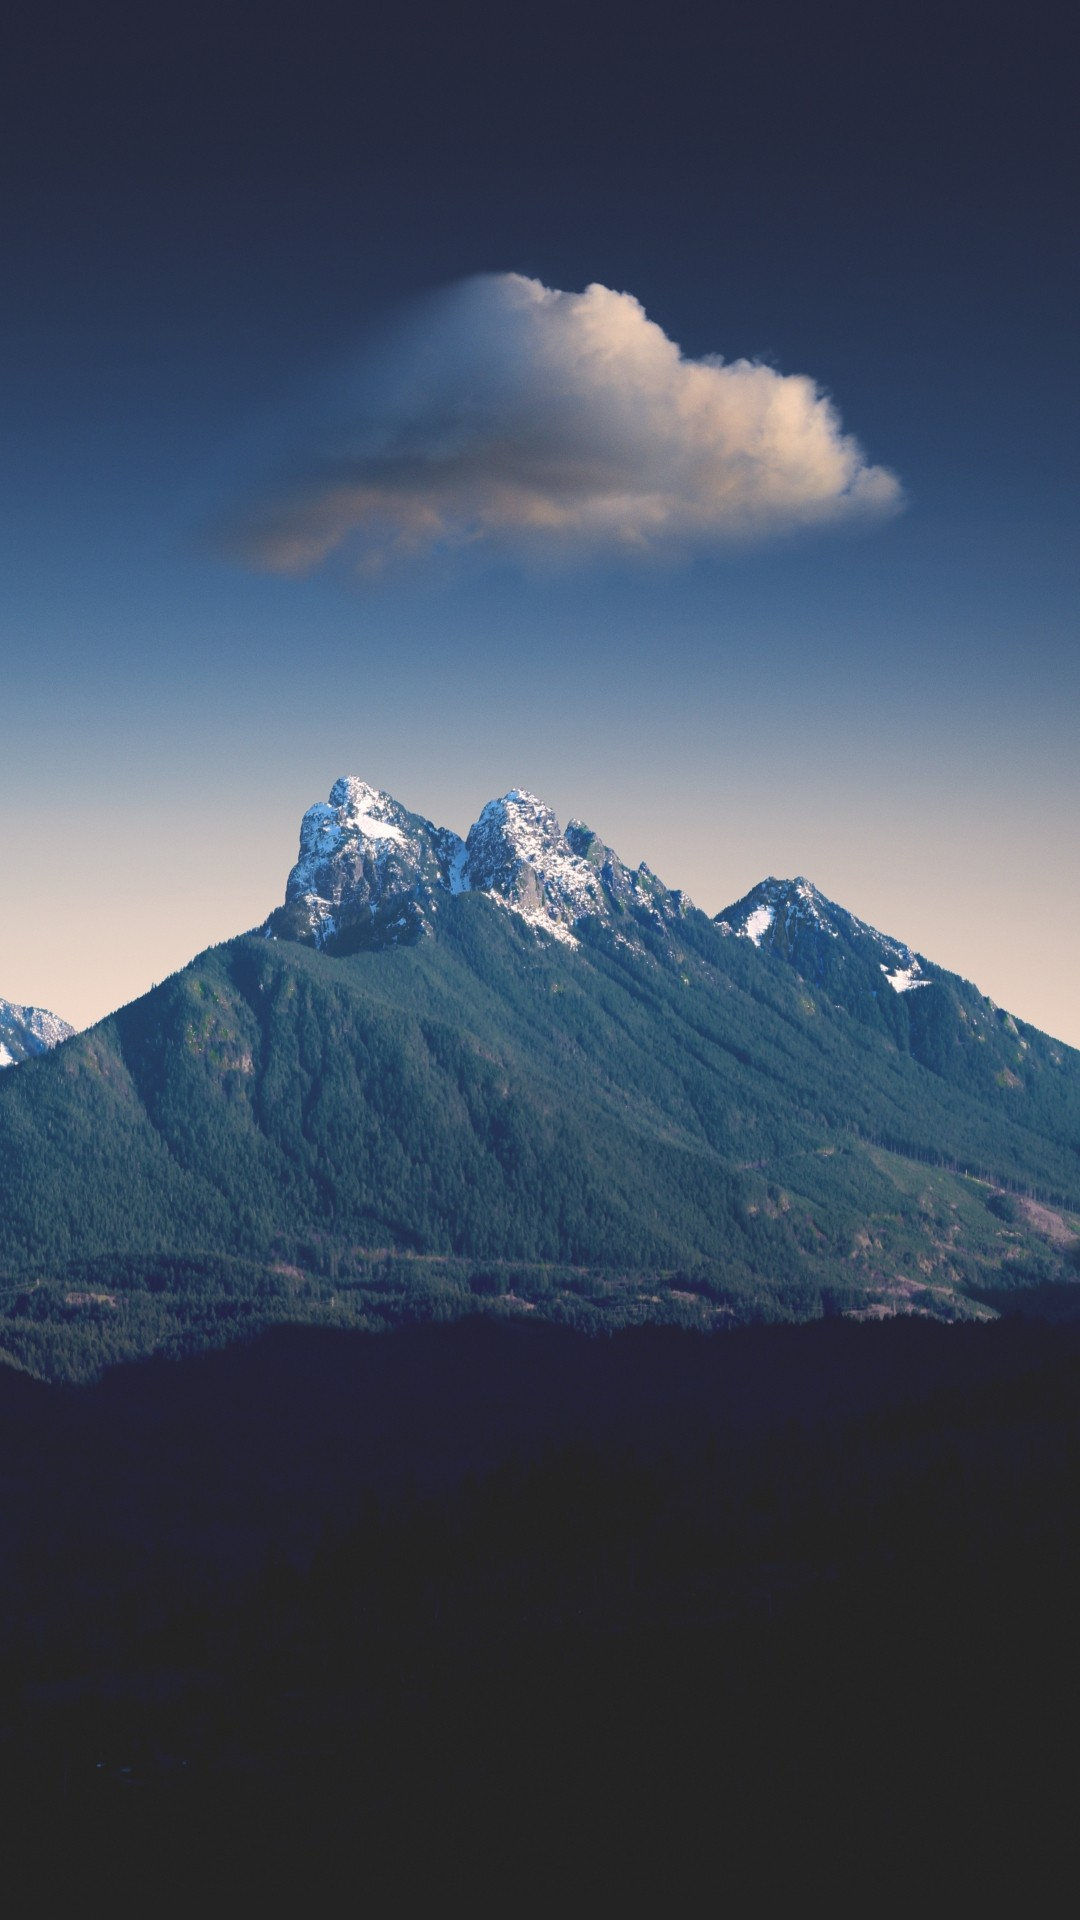 Mountain iphone 6 wallpaper